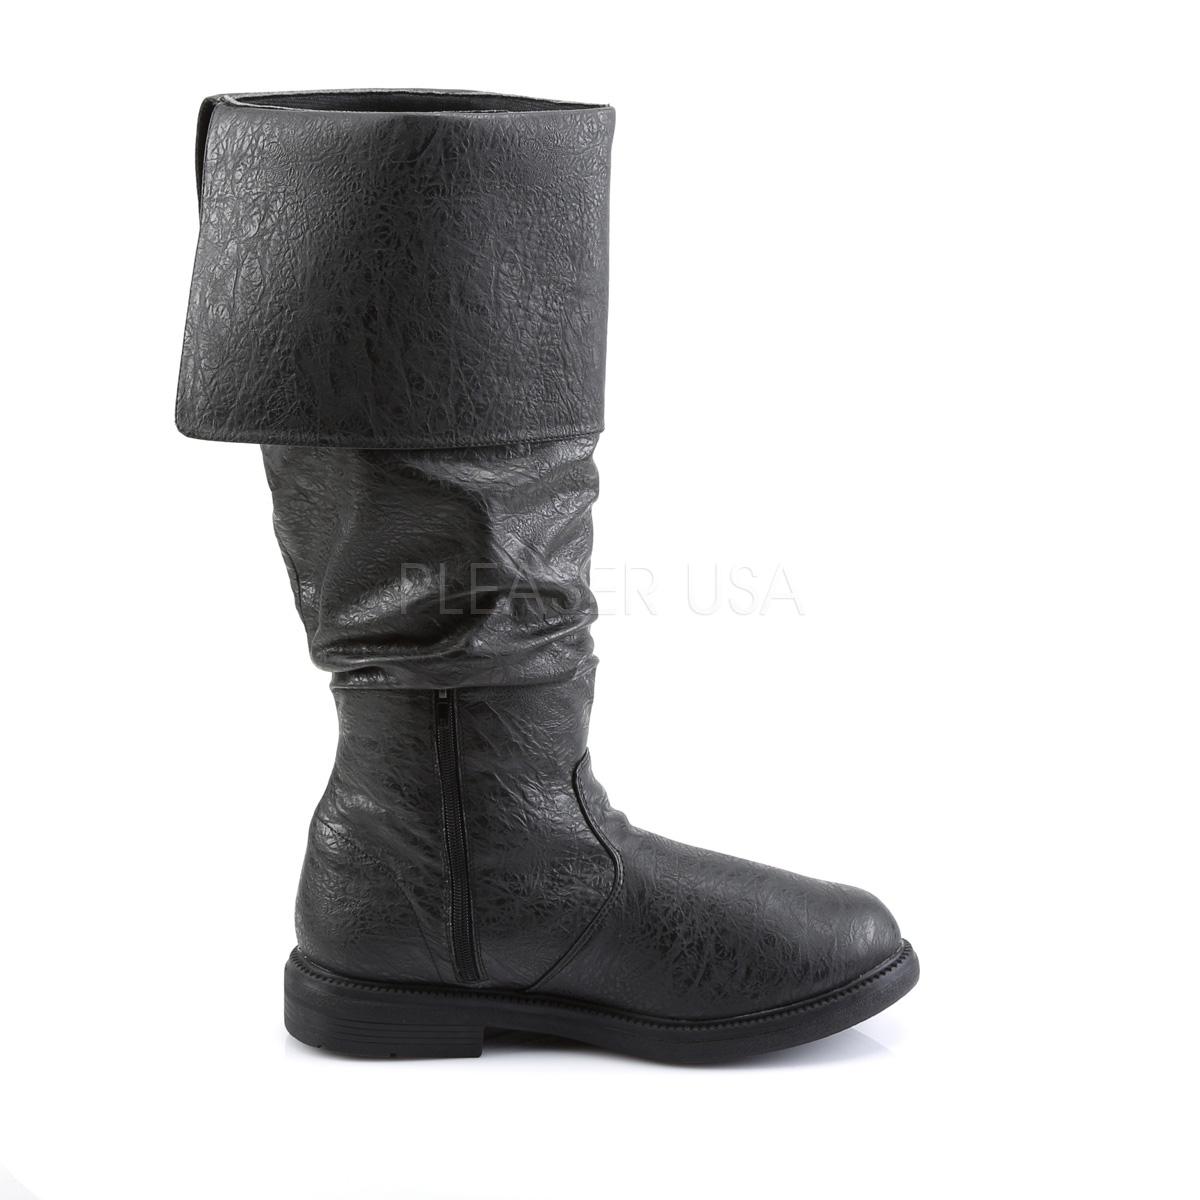 FUNTASMA ROBINHOOD-100 #Men's メンズブーツ 折り返しブーツ 黒 ブラック Pleaser◆取り寄せ